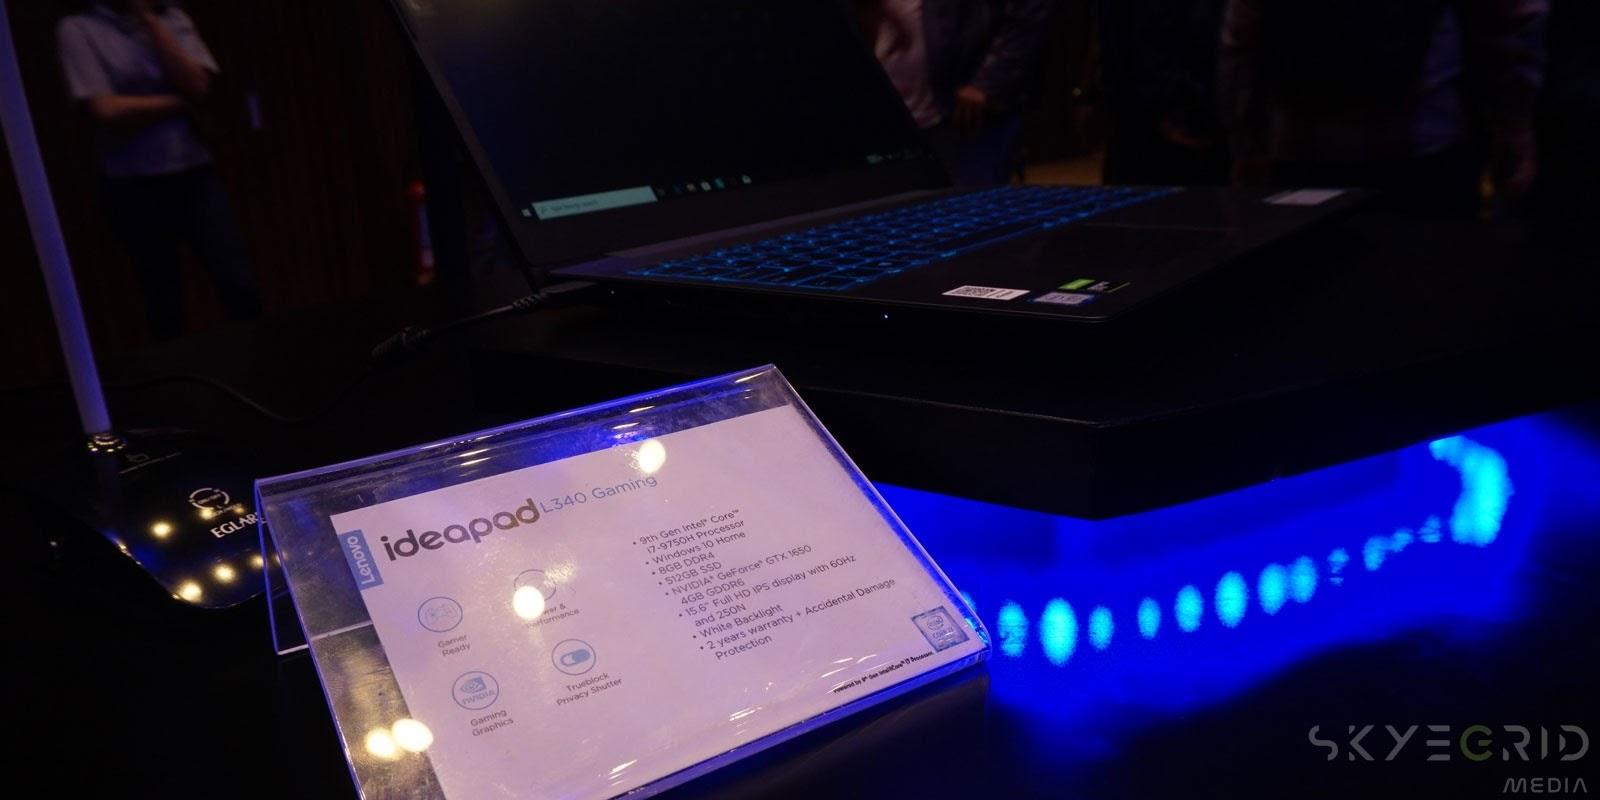 Spesifikasi IdeaPad L340 Gaming di Indonesia